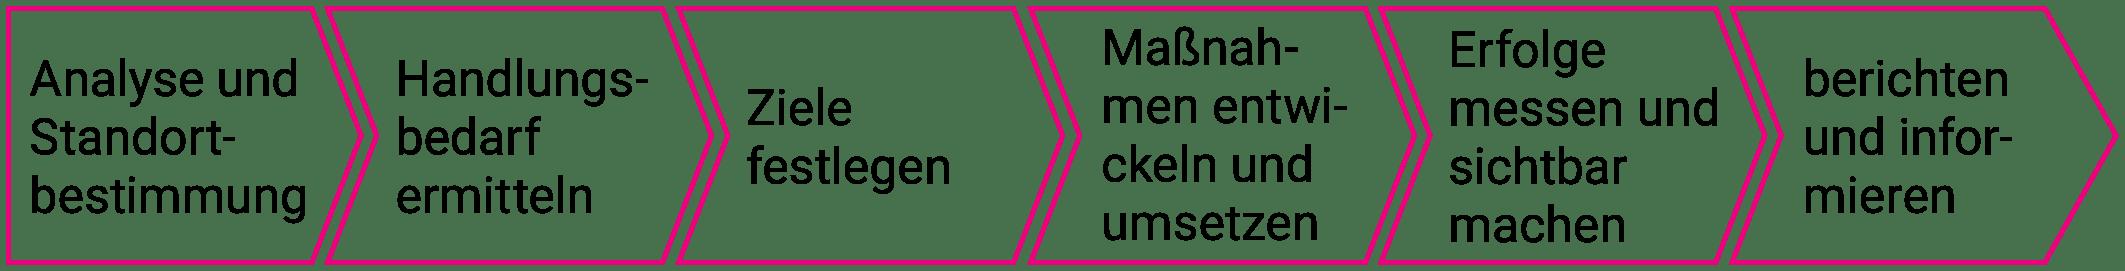 konzept-image